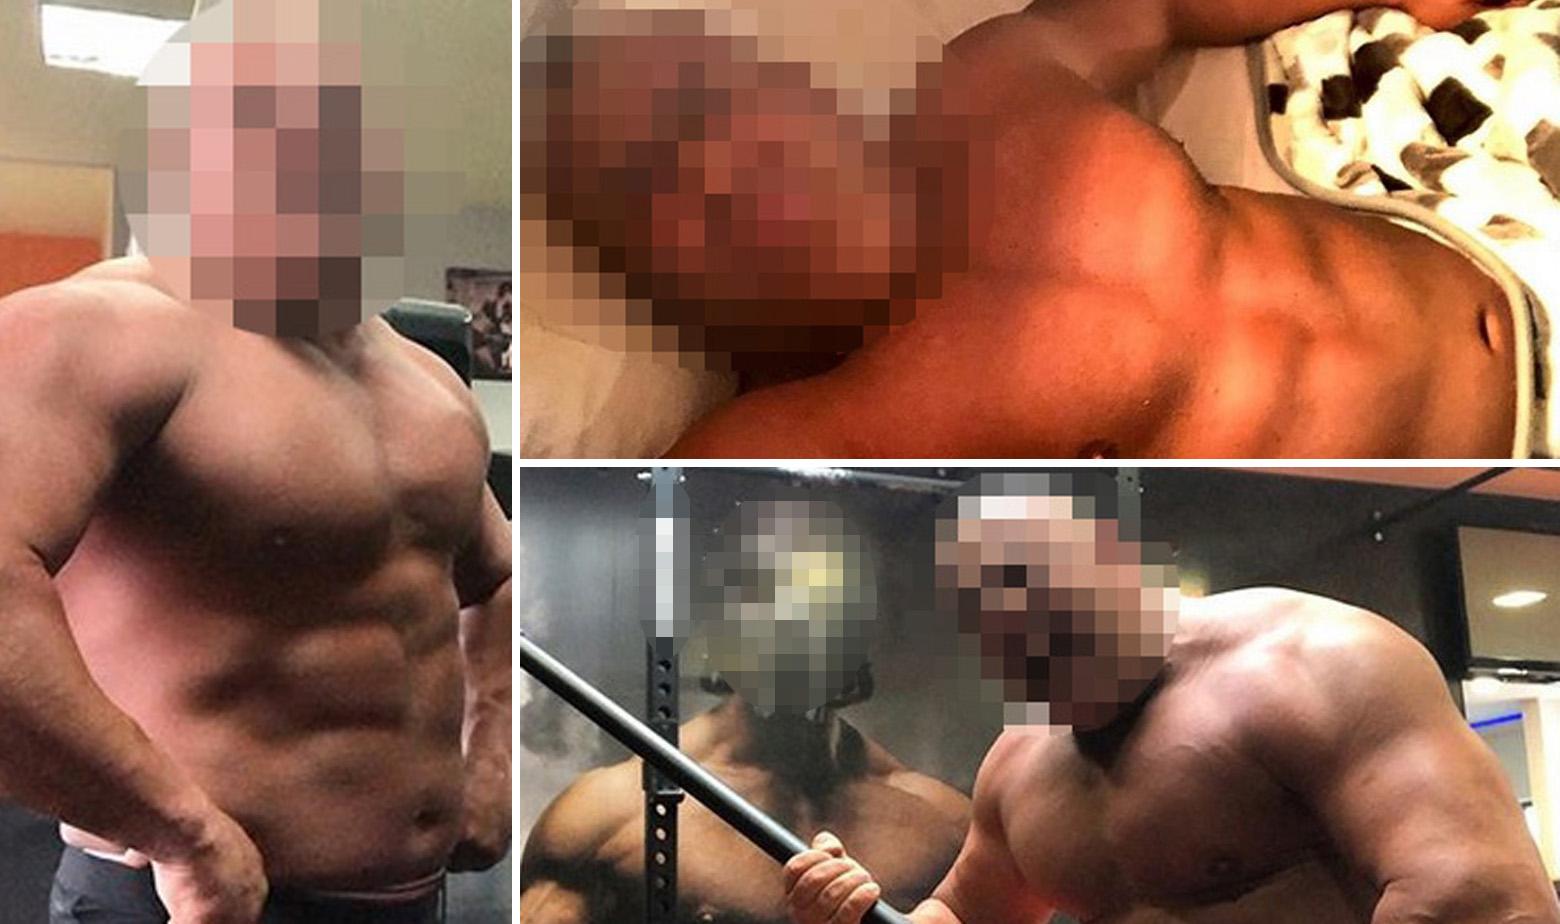 Vulgarni policajac bilder